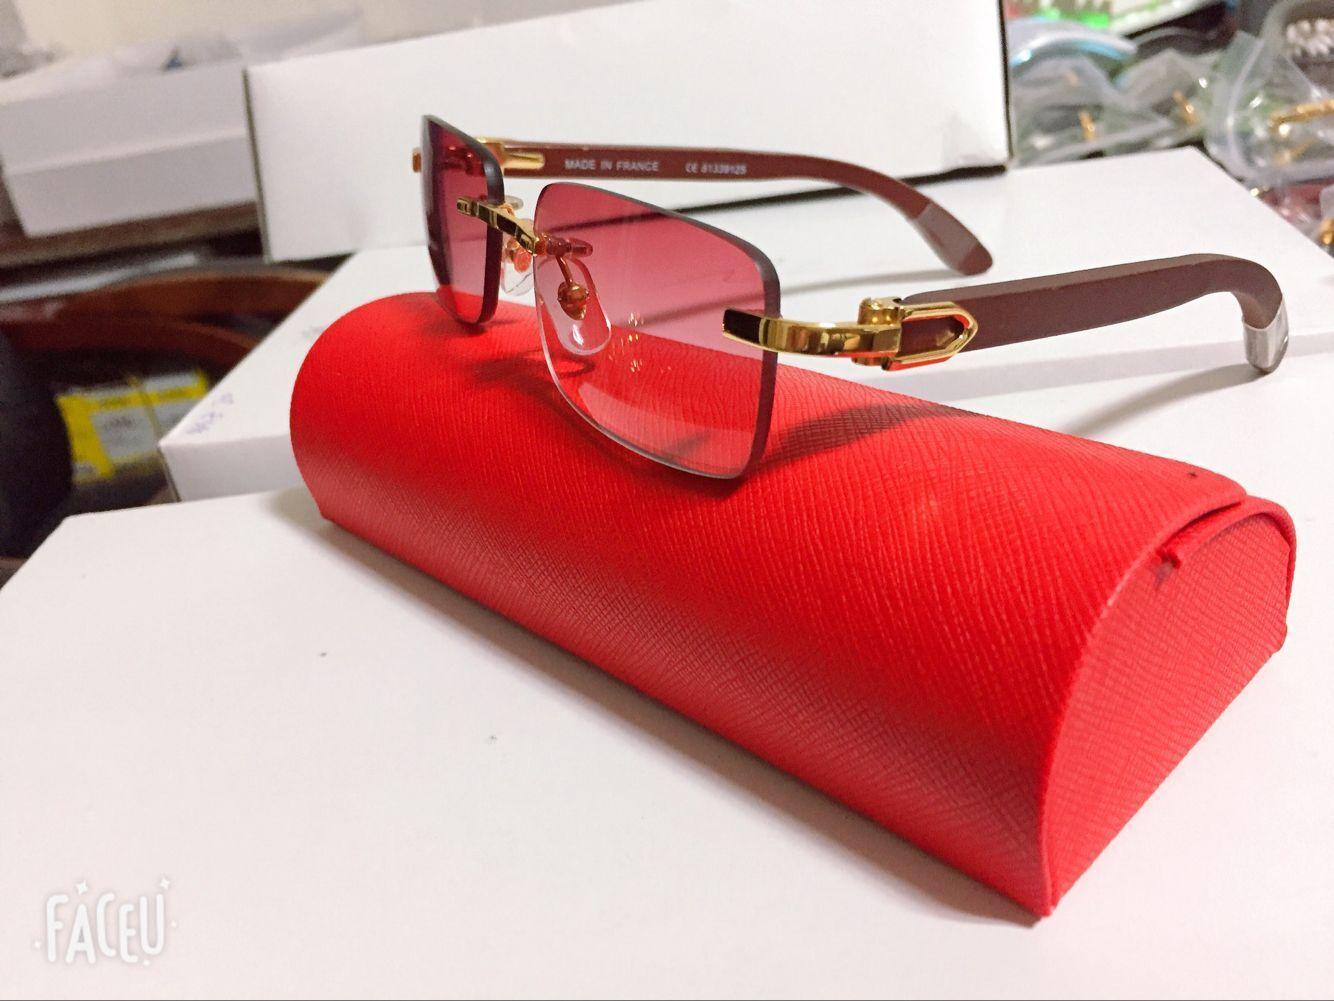 Quadro Hot Selling chifre de búfalo Óculos Moda Masculina Esporte óculos sem aro Decor Alloy Buffalo pernas de madeira Men Sunglasses lunettes de soleil